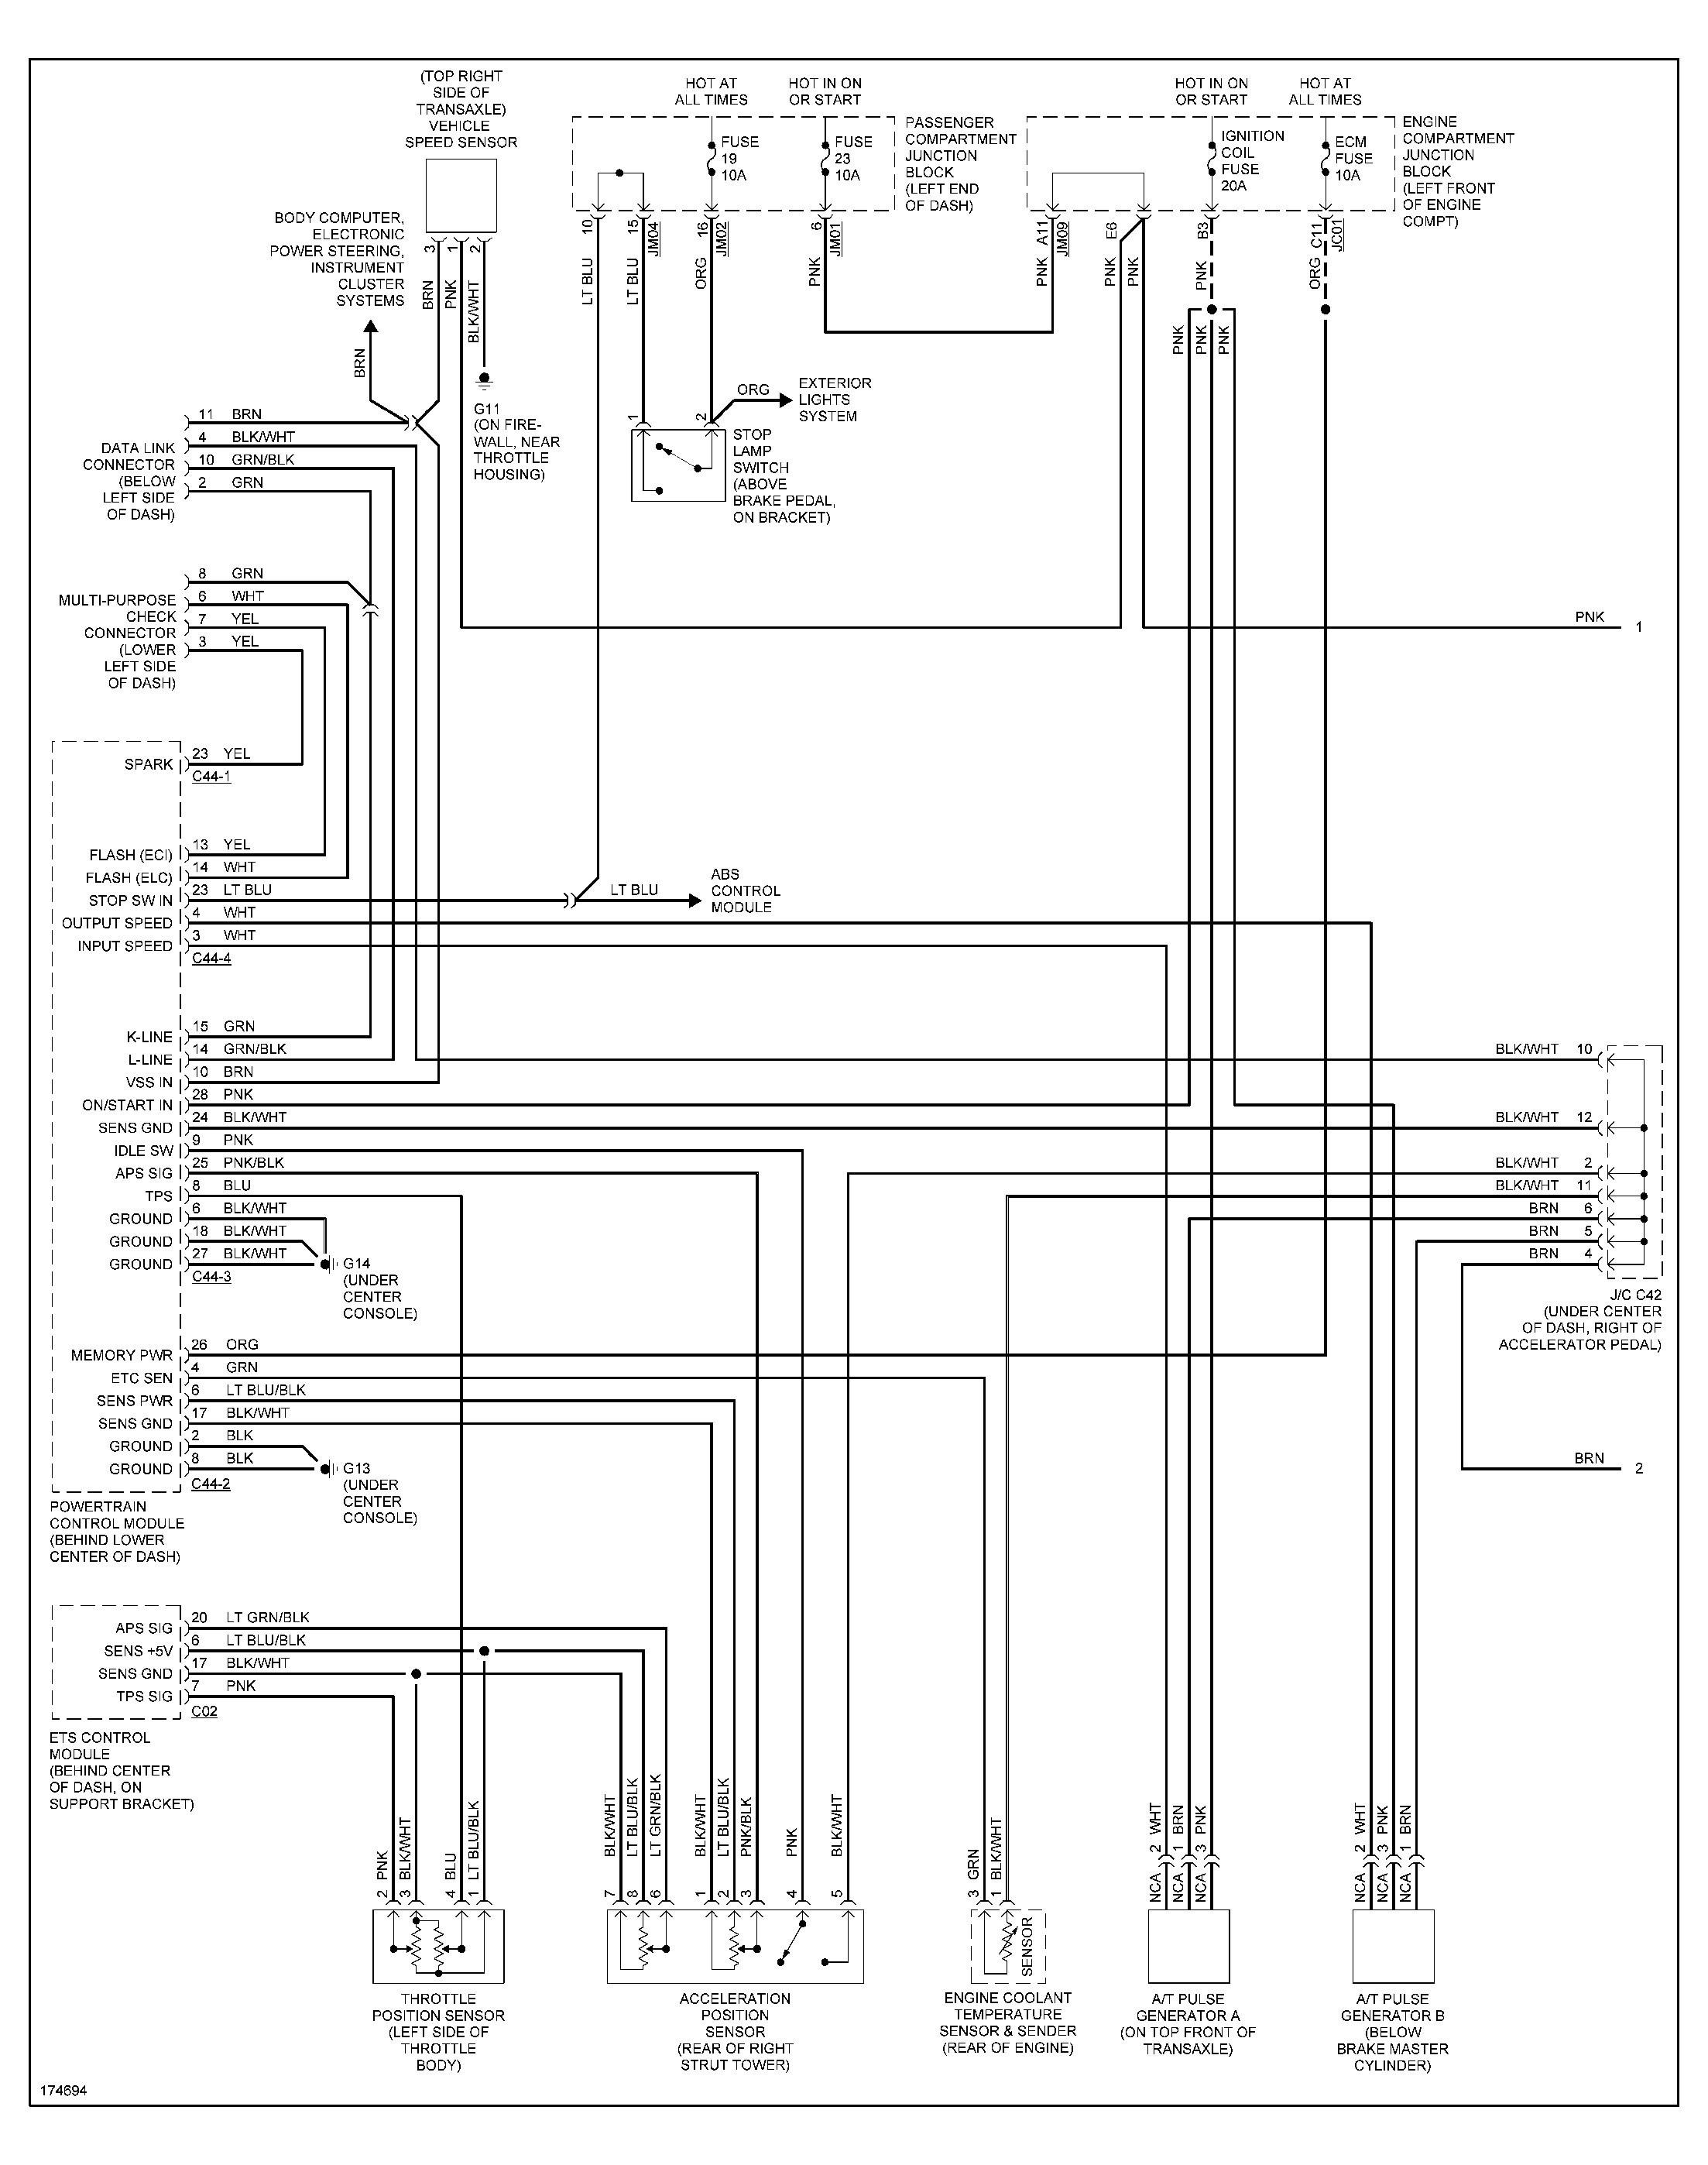 2001 Hyundai Santa Fe Radio Wire Diagram 2008 Ford F550 Wiring Schematic For Wiring Diagram Schematics